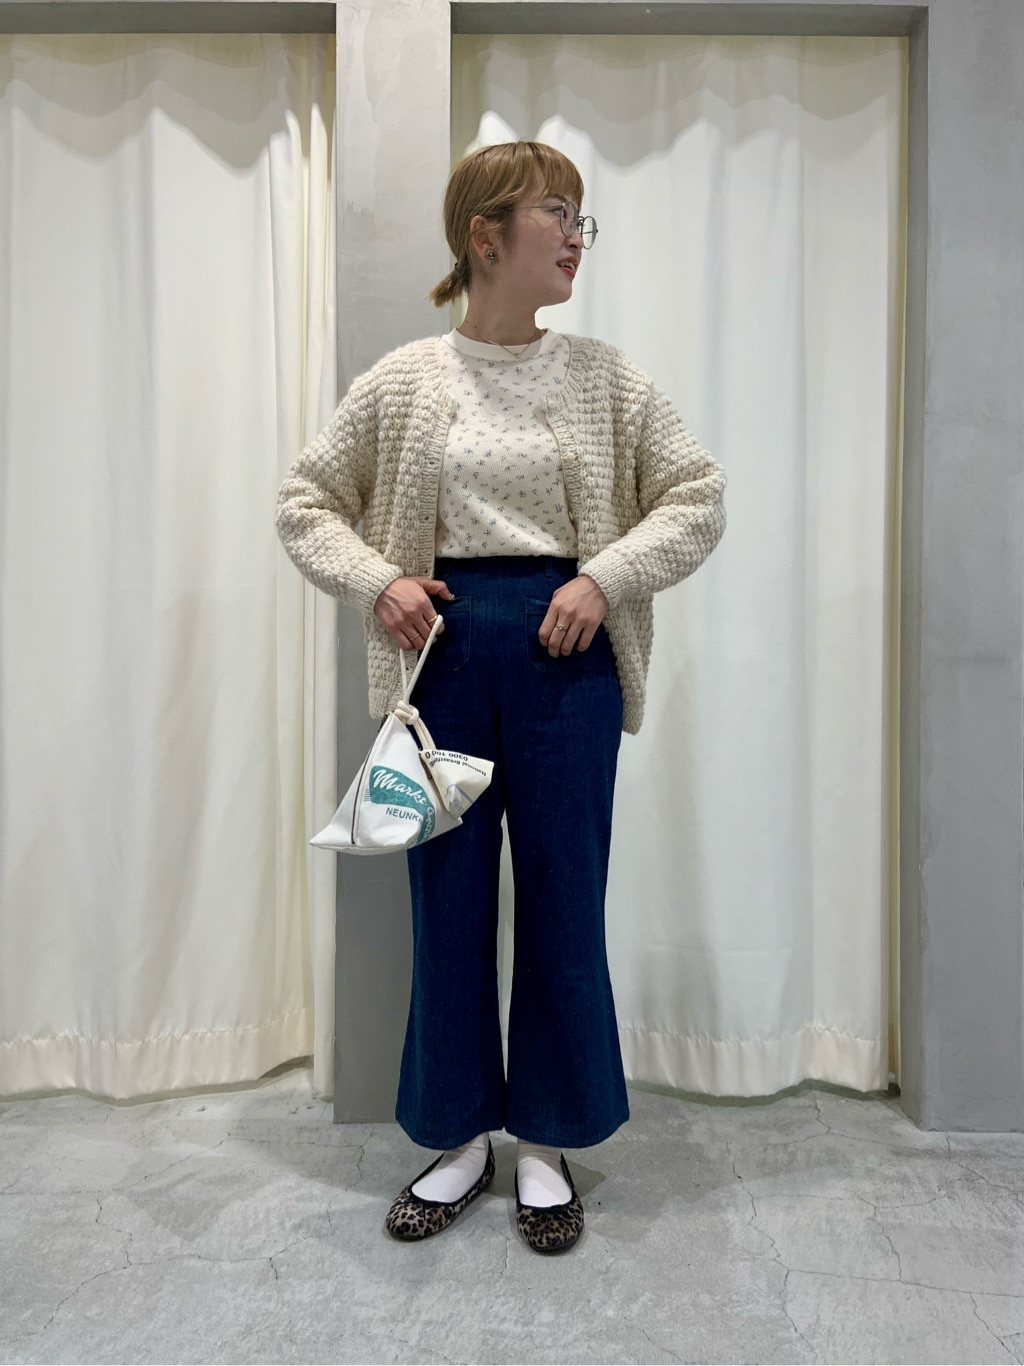 - CHILD WOMAN CHILD WOMAN , PAR ICI ルミネ池袋 身長:160cm 2020.09.25